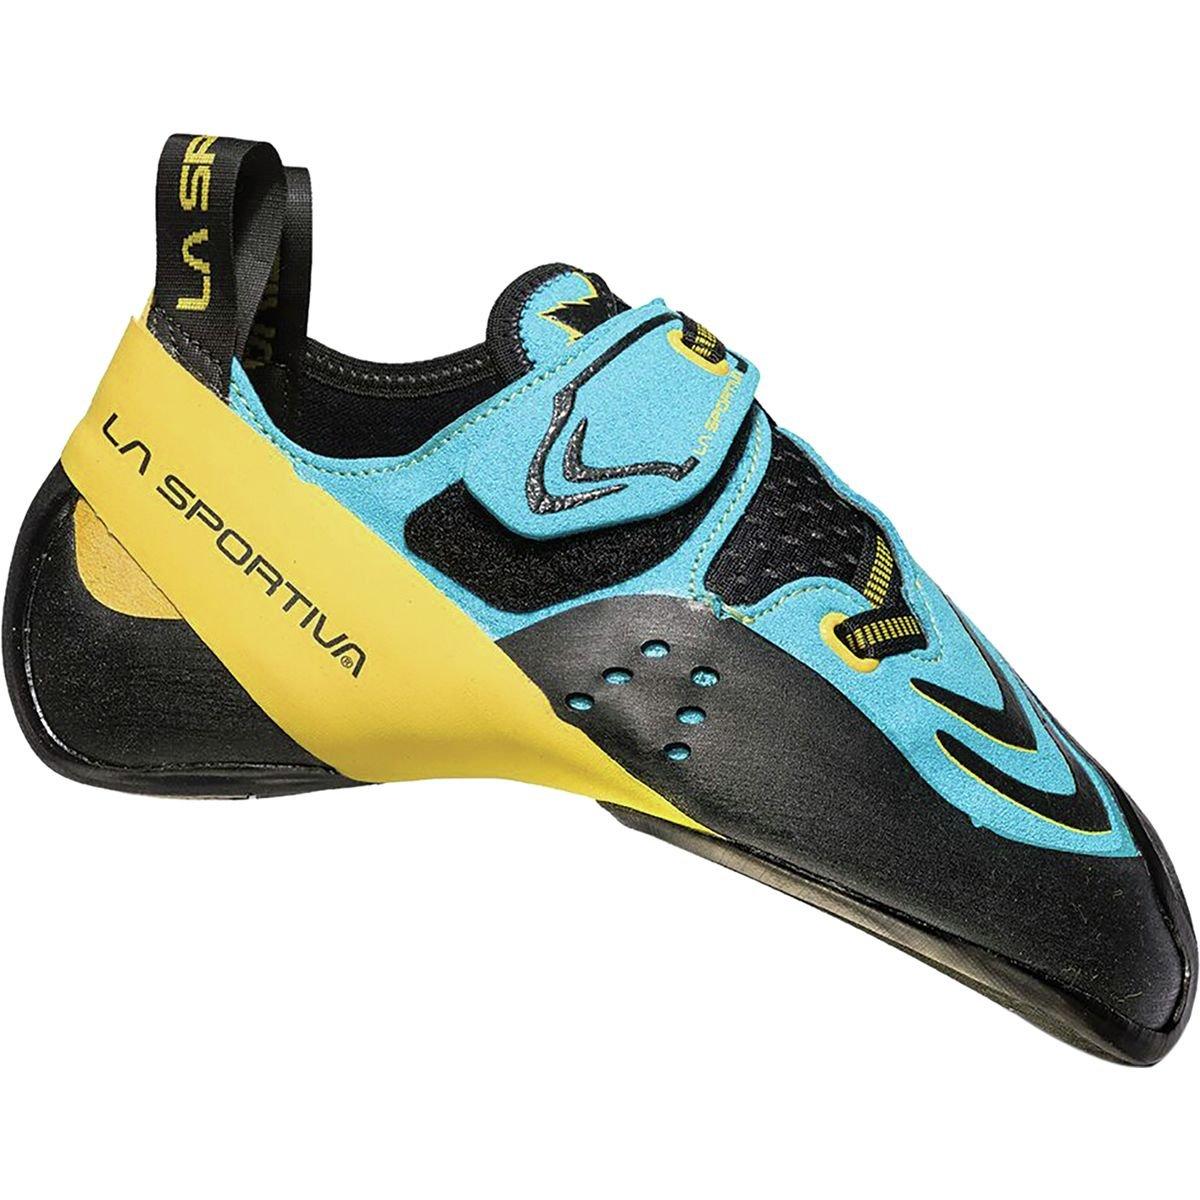 La Sportiva メンズ La Sportiva Futura Rock Climbing Shoe - Men's B071G76WZX 41 M EU|ブルー/イエロー ブルー/イエロー 41 M EU